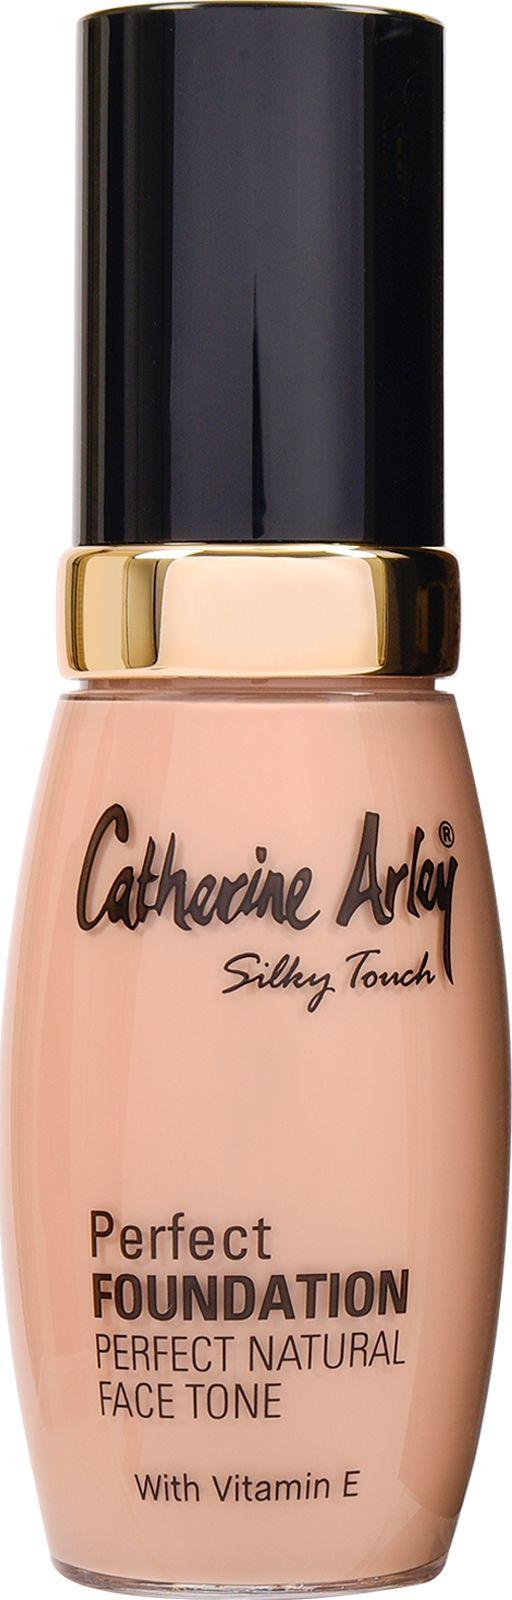 Тональный крем Catherine Arley Perfect, тон №65, 55 мл